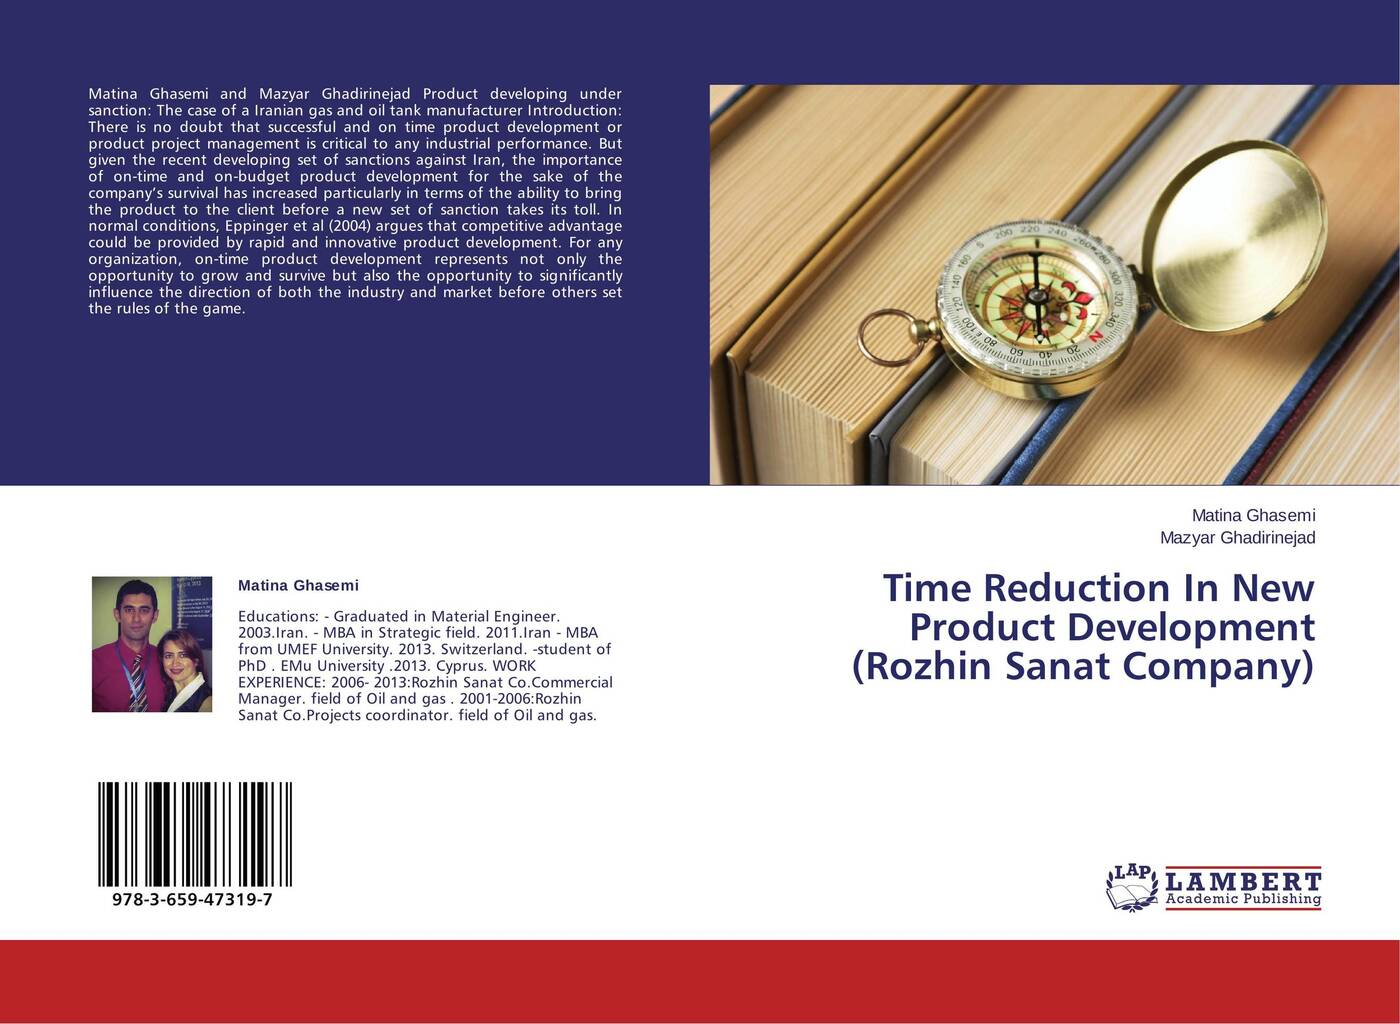 Matina Ghasemi and Mazyar Ghadirinejad Time Reduction In New Product Development (Rozhin Sanat Company)